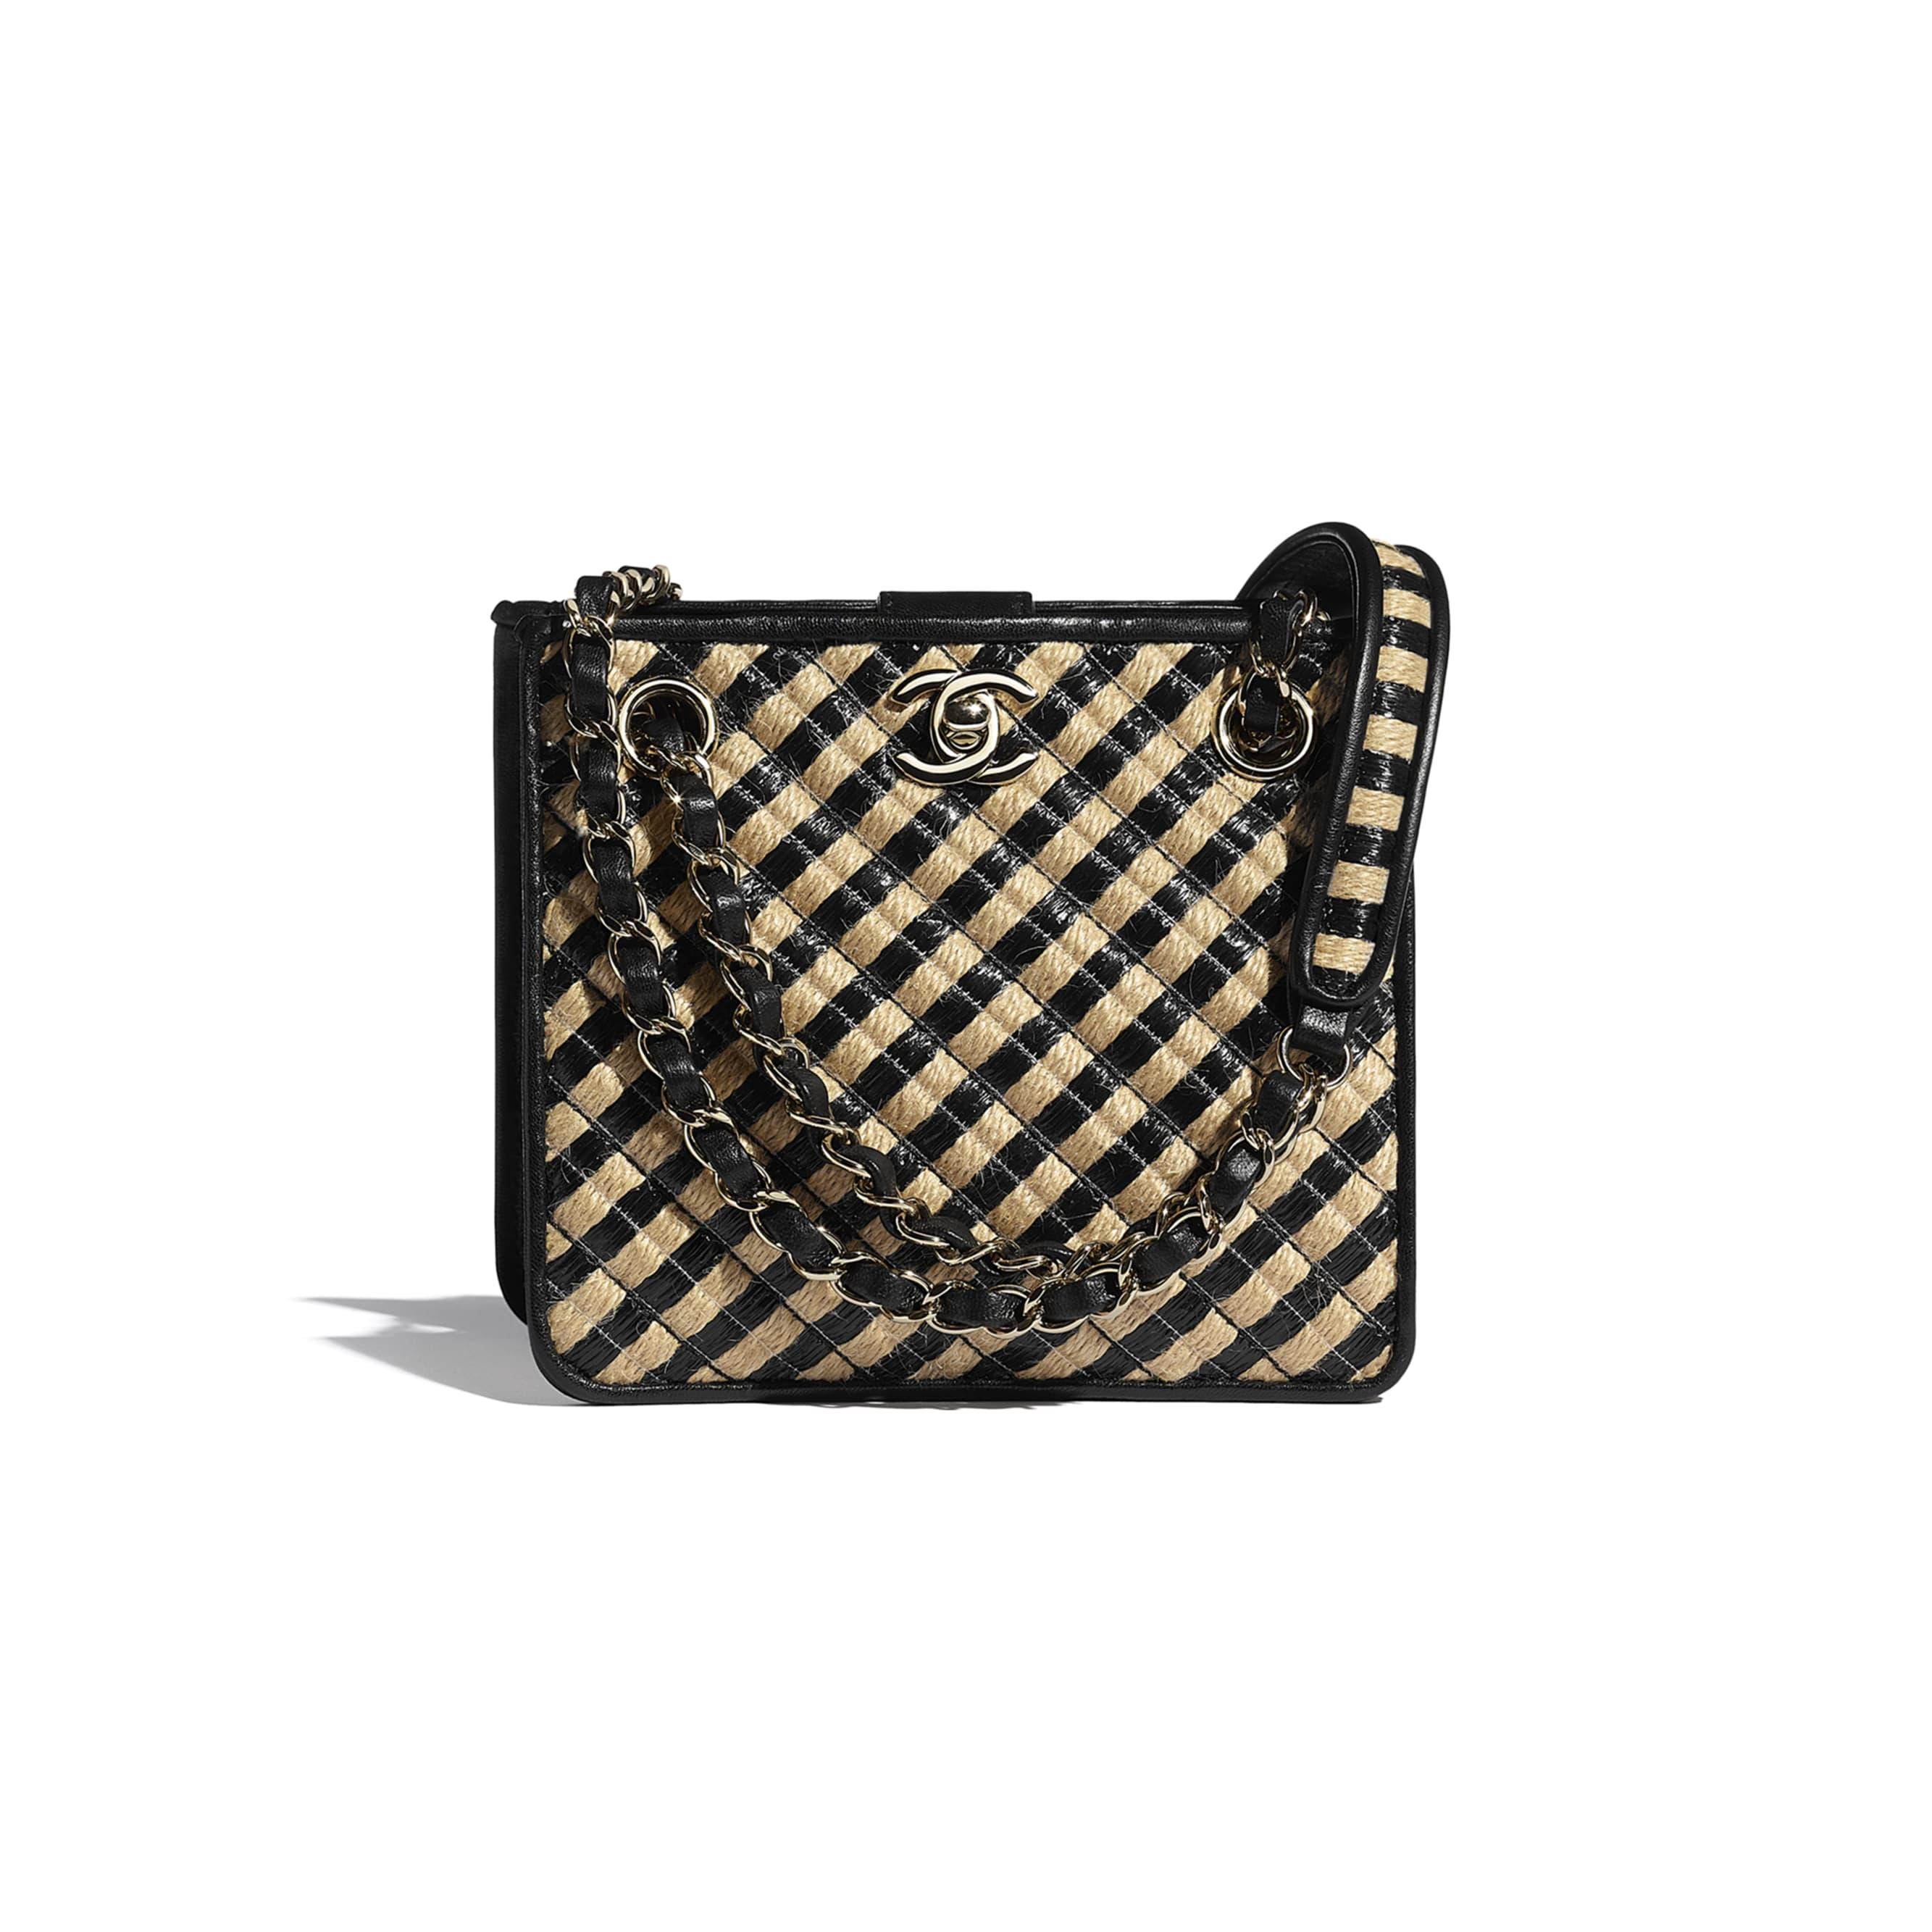 Drawstring Bag - Black & Beige - Raffia, Jute Thread & Gold-Tone Metal - CHANEL - Default view - see standard sized version